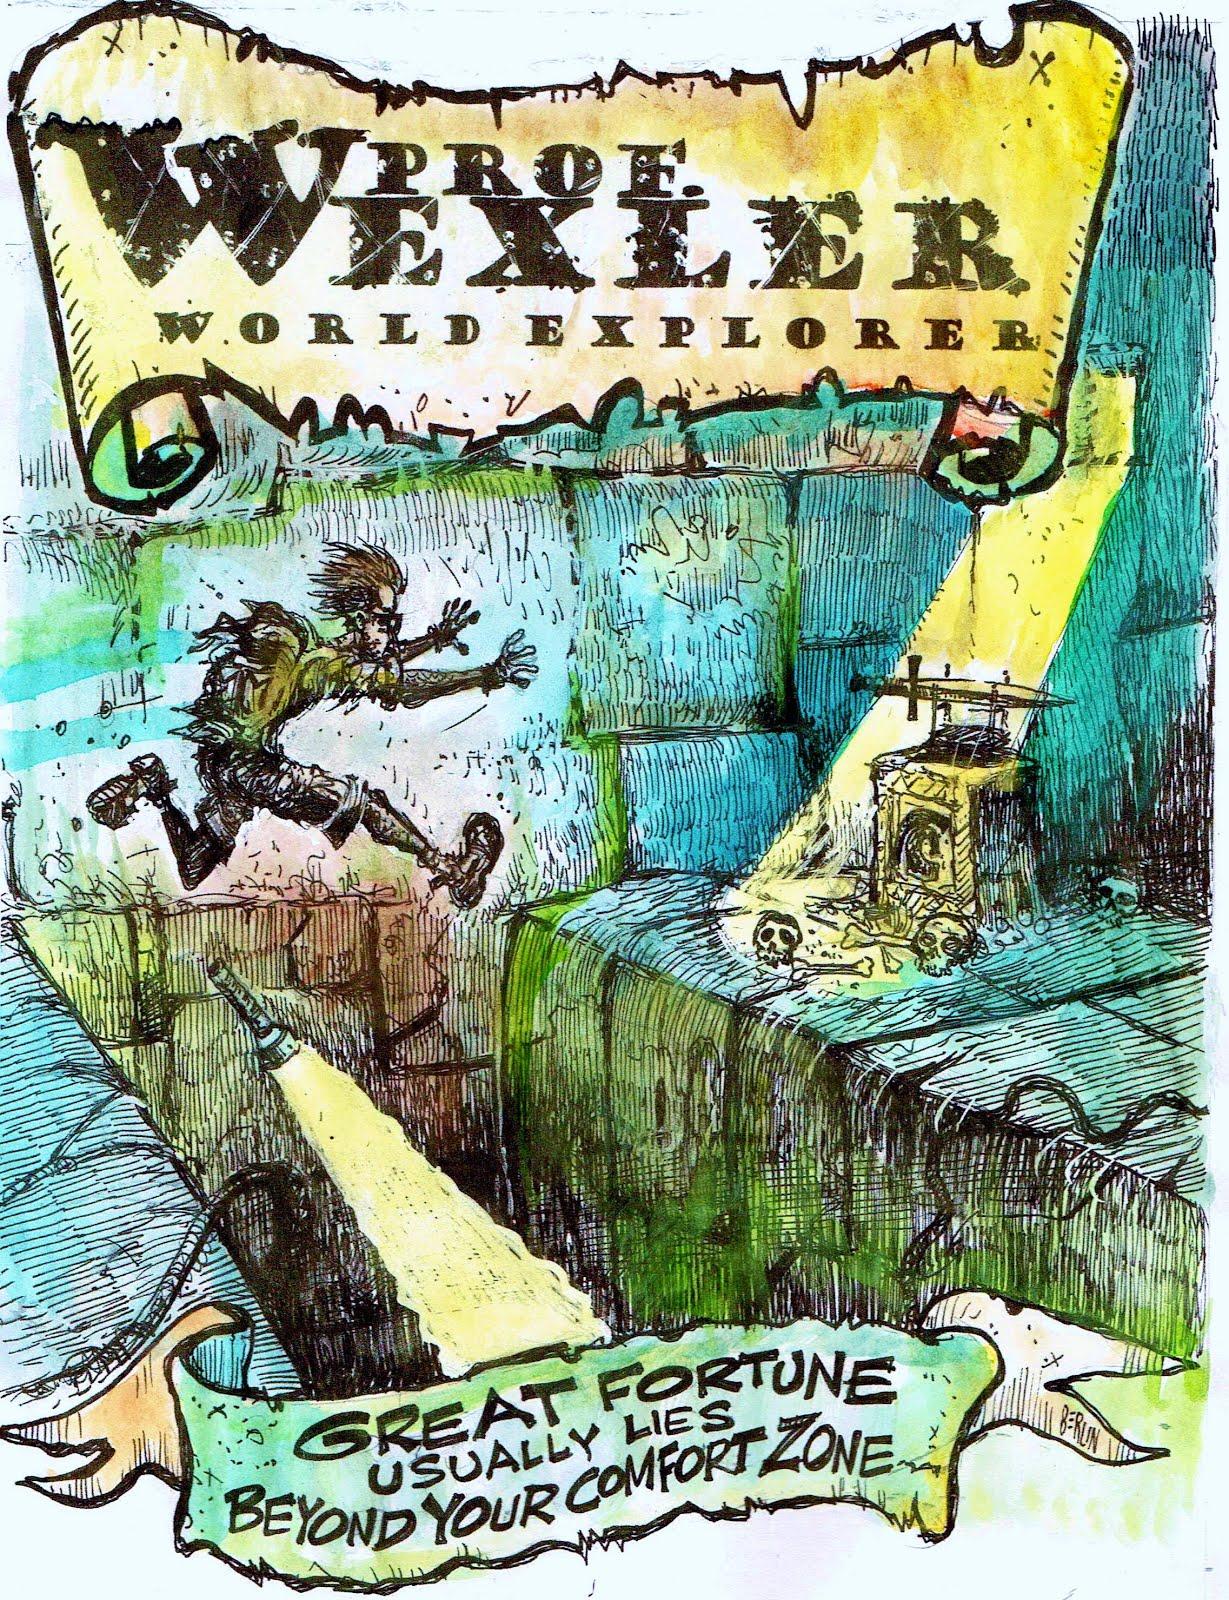 WWW.WEXCLUB.COM